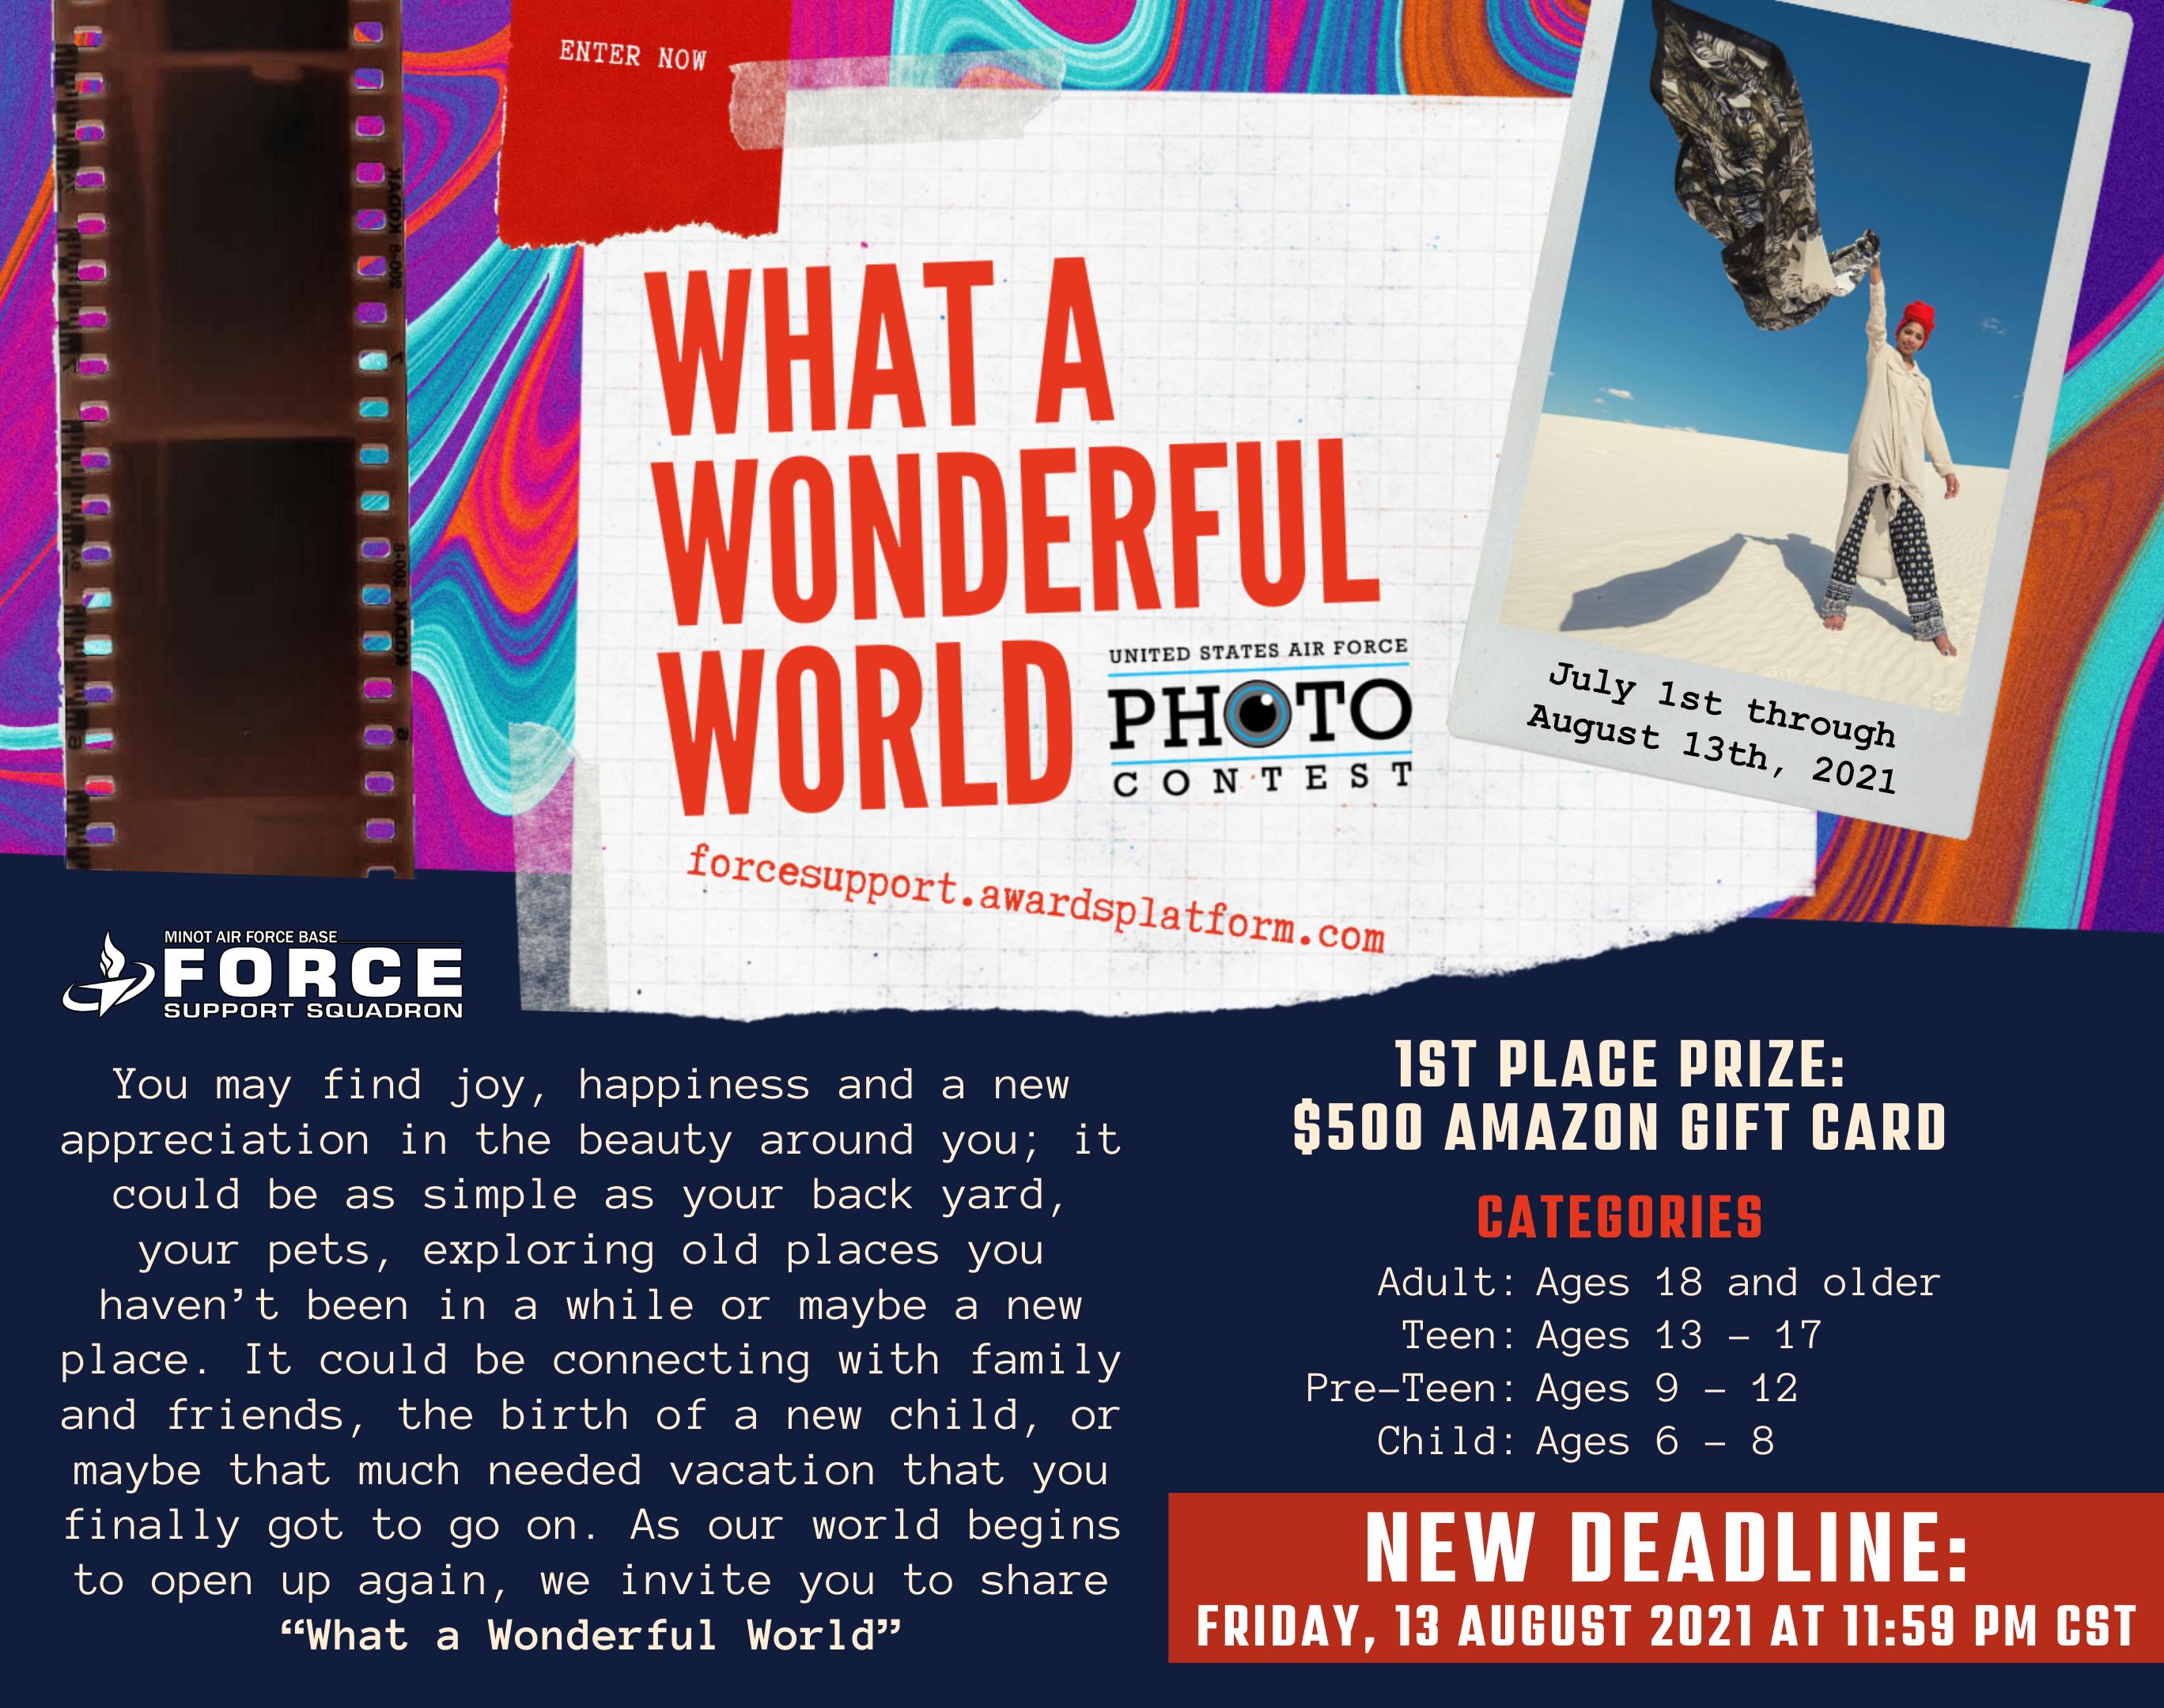 AF Photo Contest - AUG